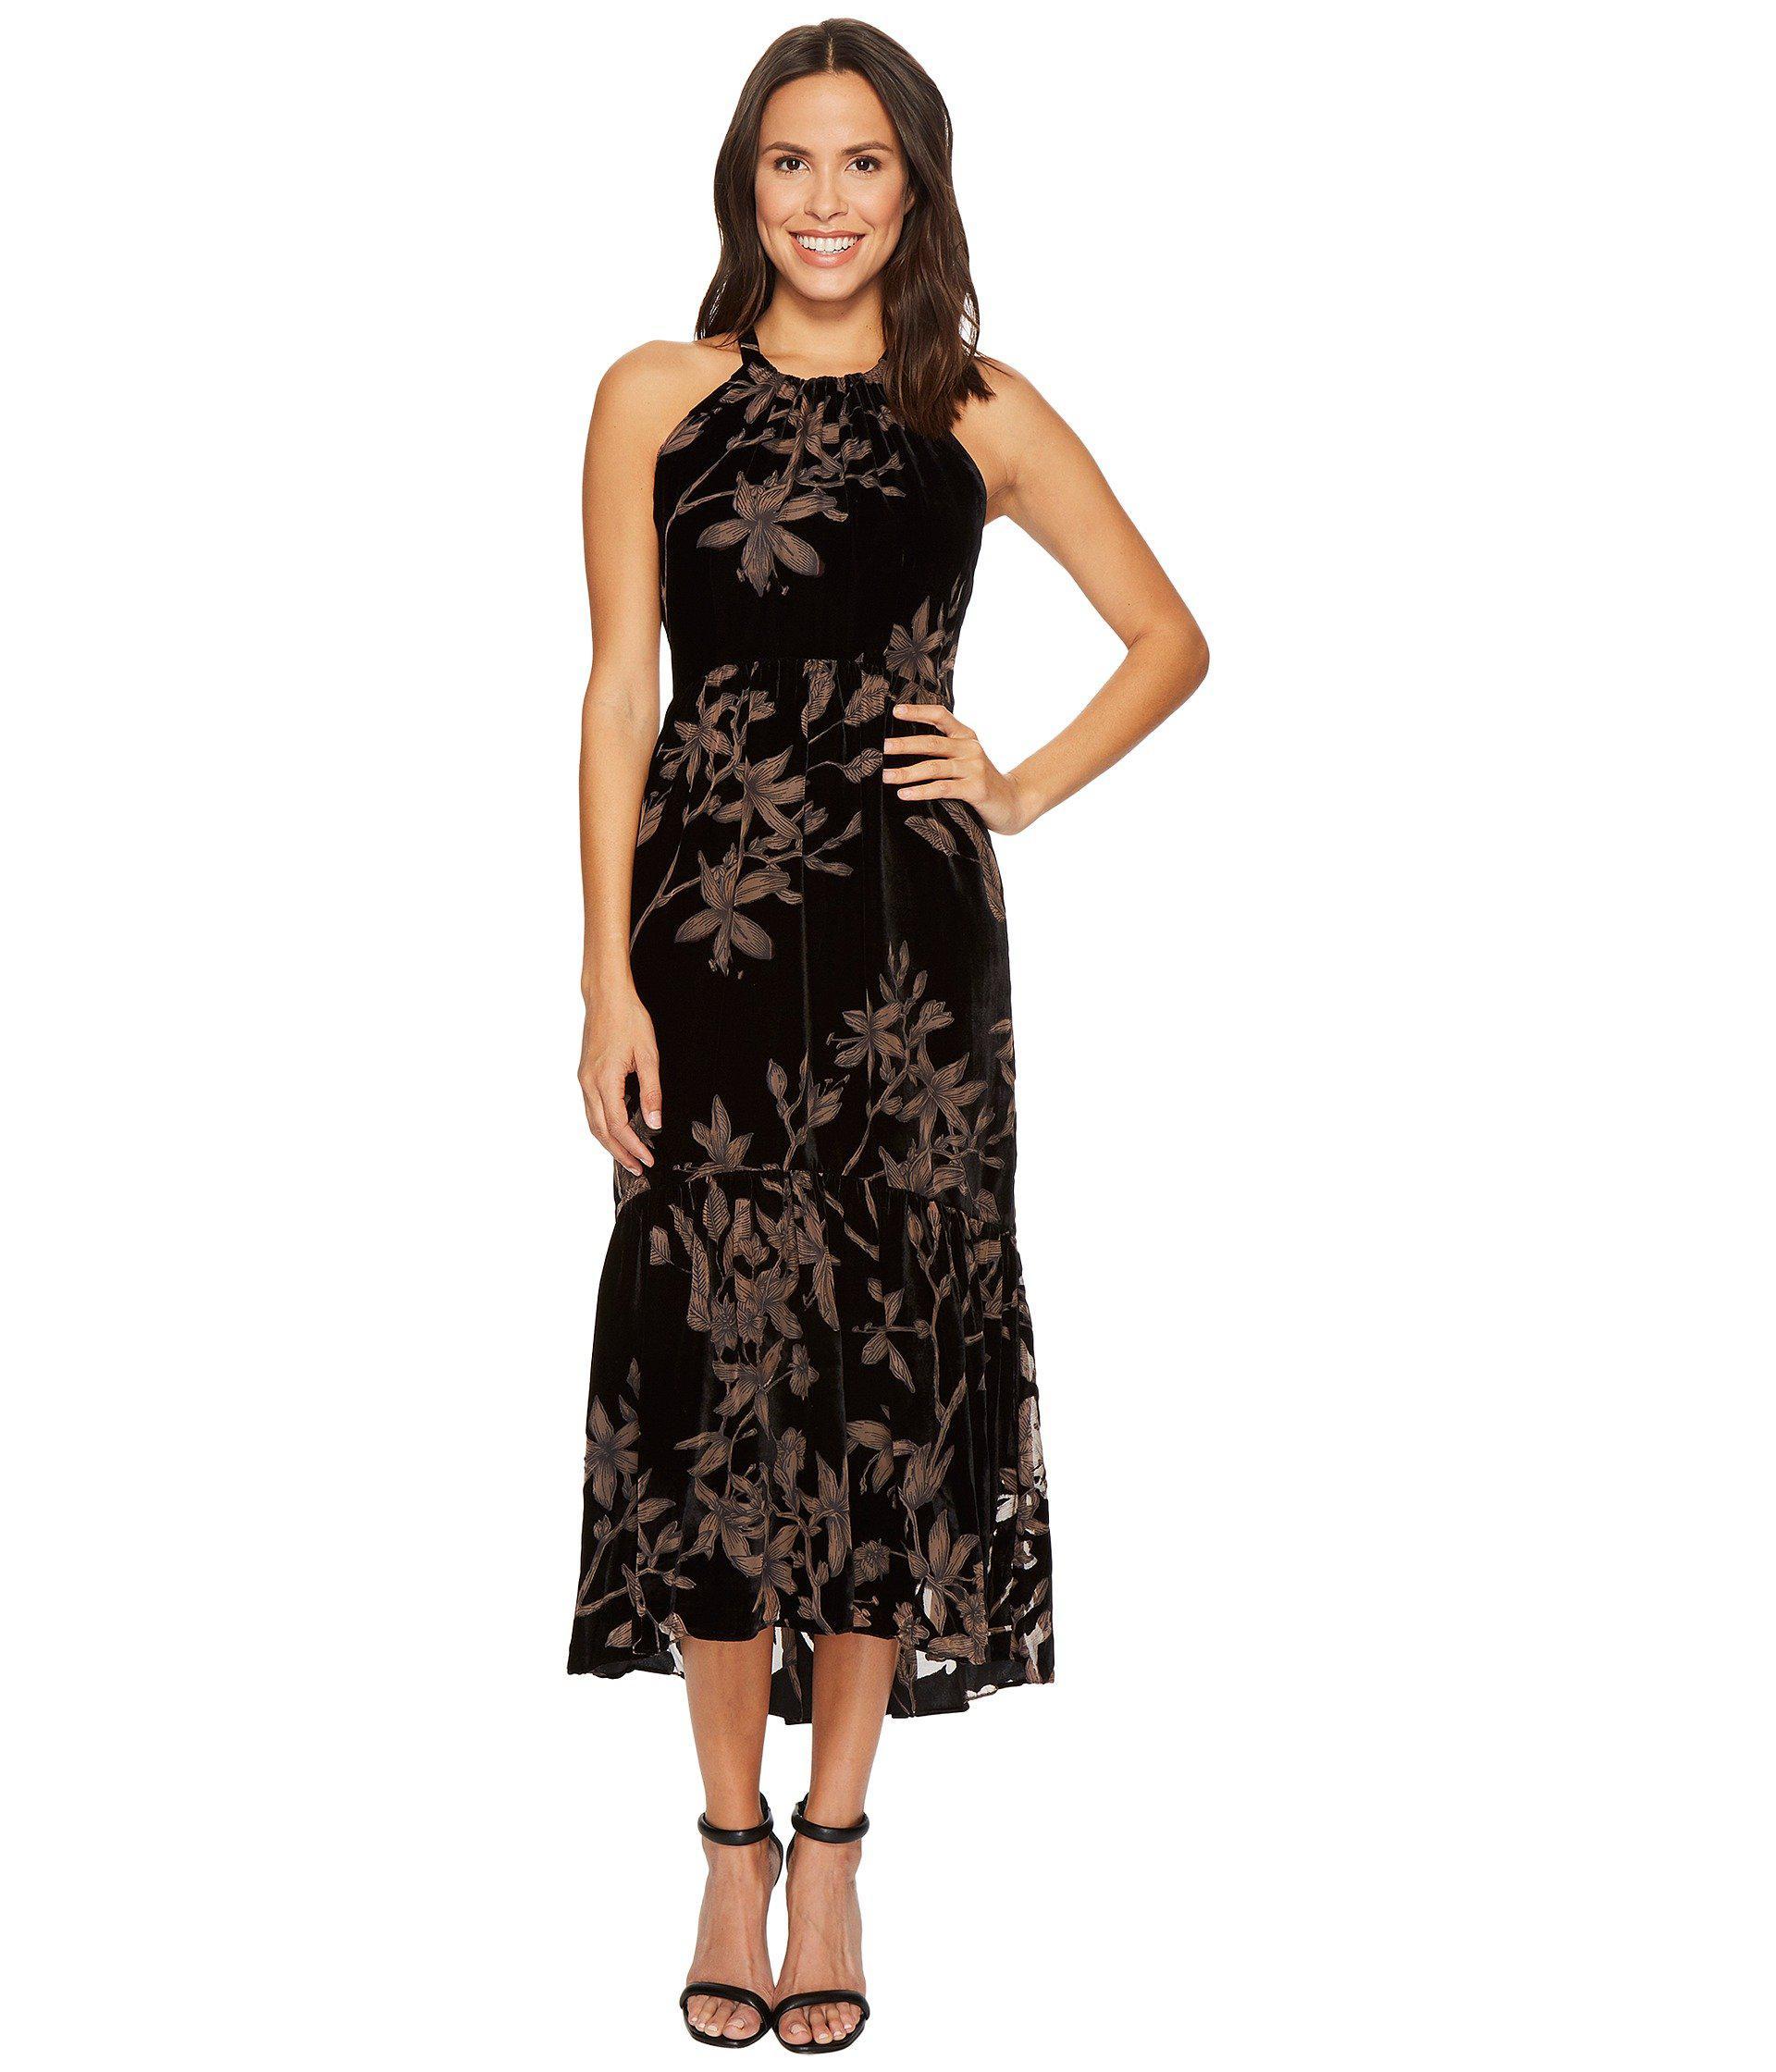 23437cdf96c Lyst - Vince Camuto Printed Velvet Halter High-low Midi Dress in ...